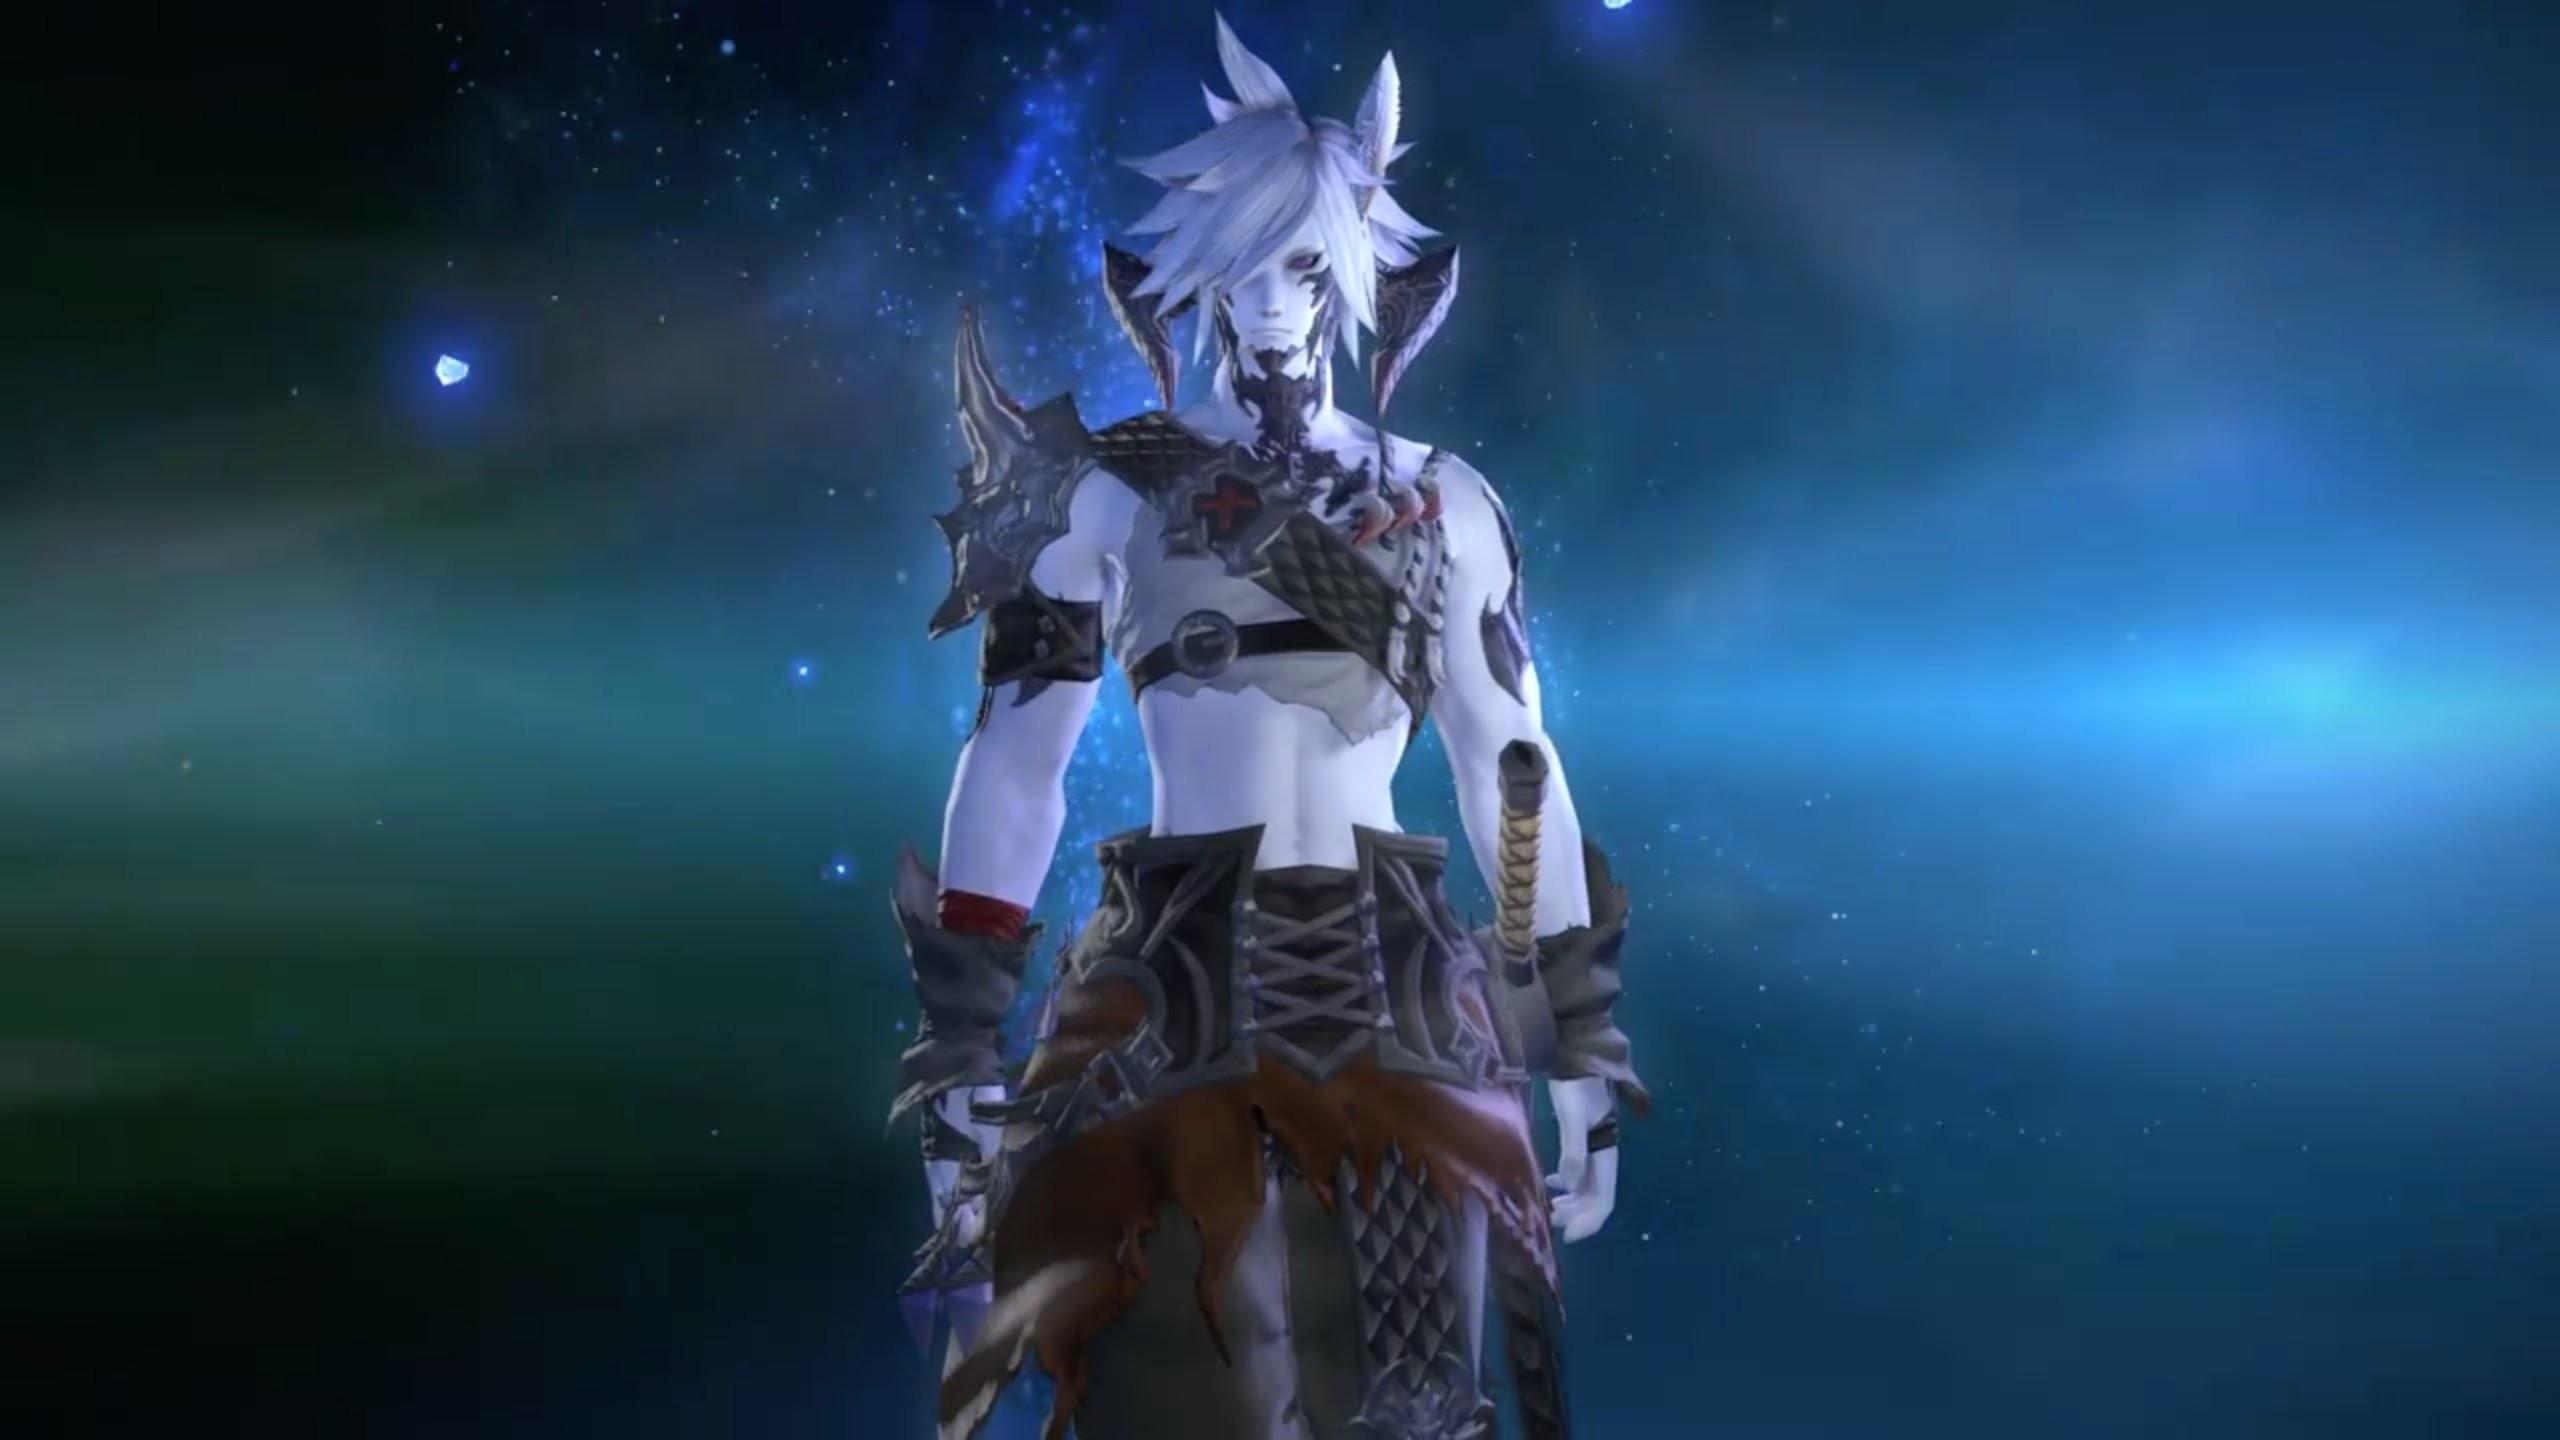 Final Fantasy XIV Heavensward: The Unending Journey Chapter 1 – YouTube